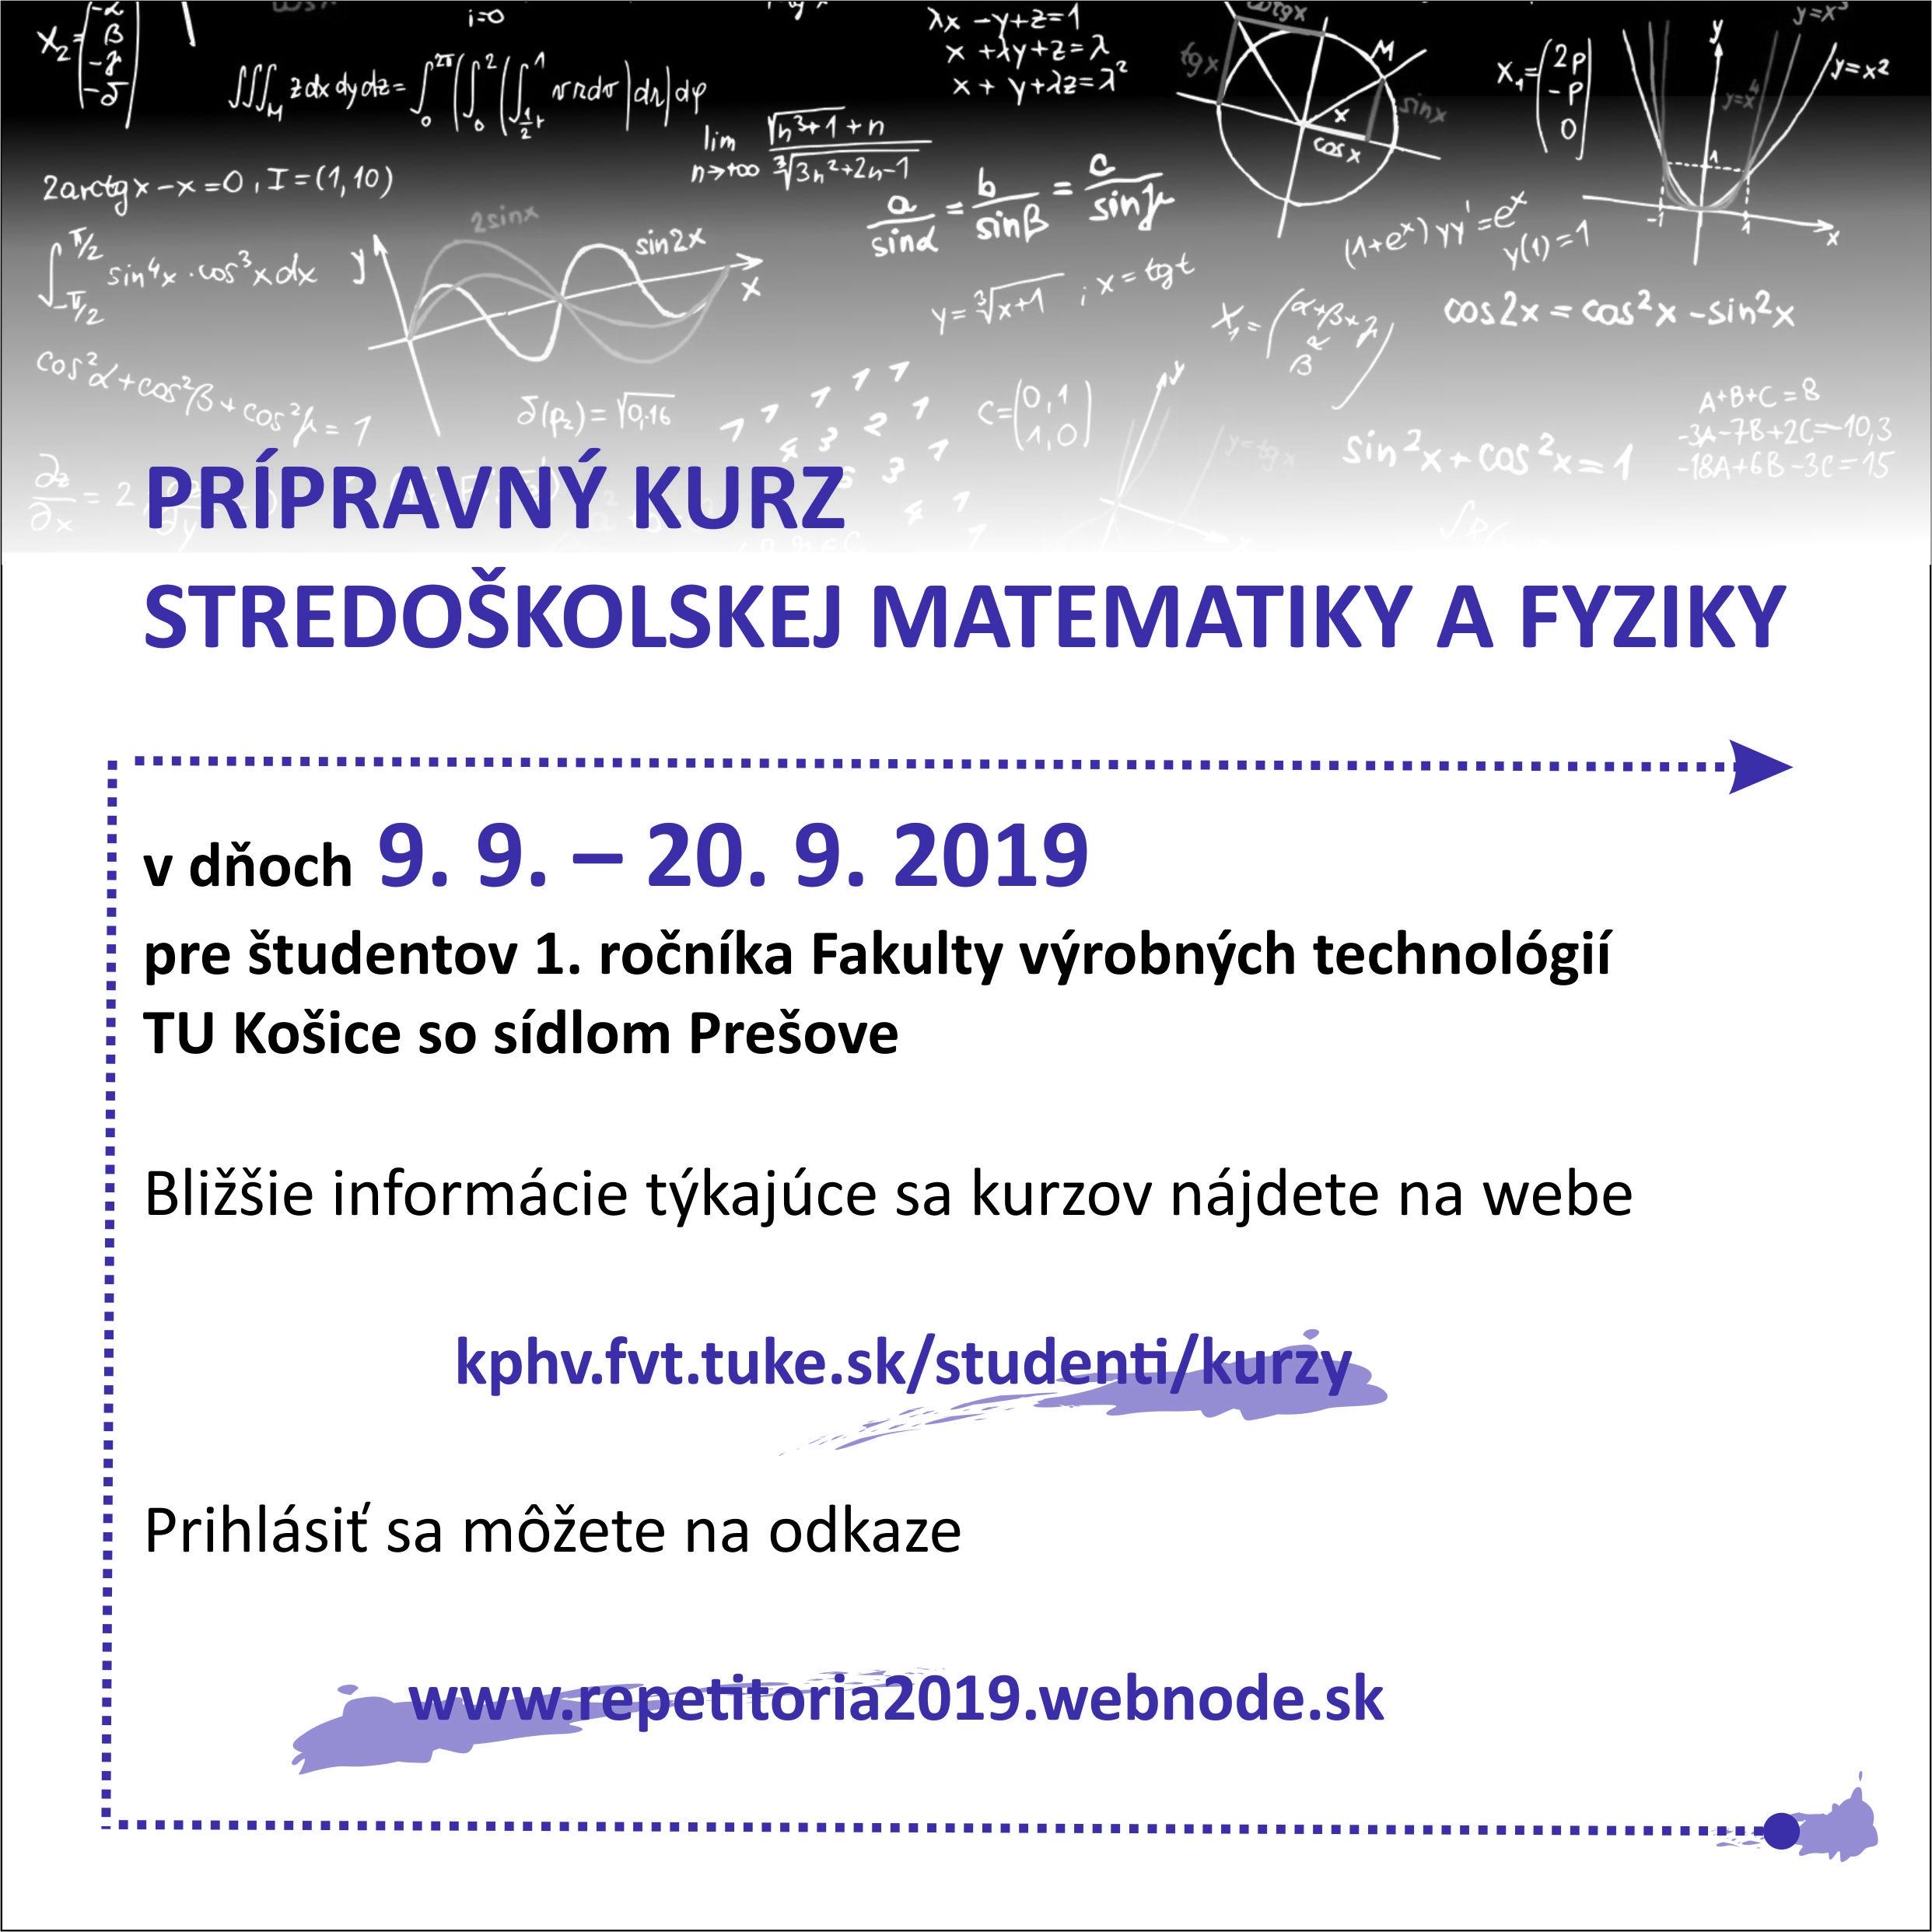 Repetitórium z matematiky a fyziky